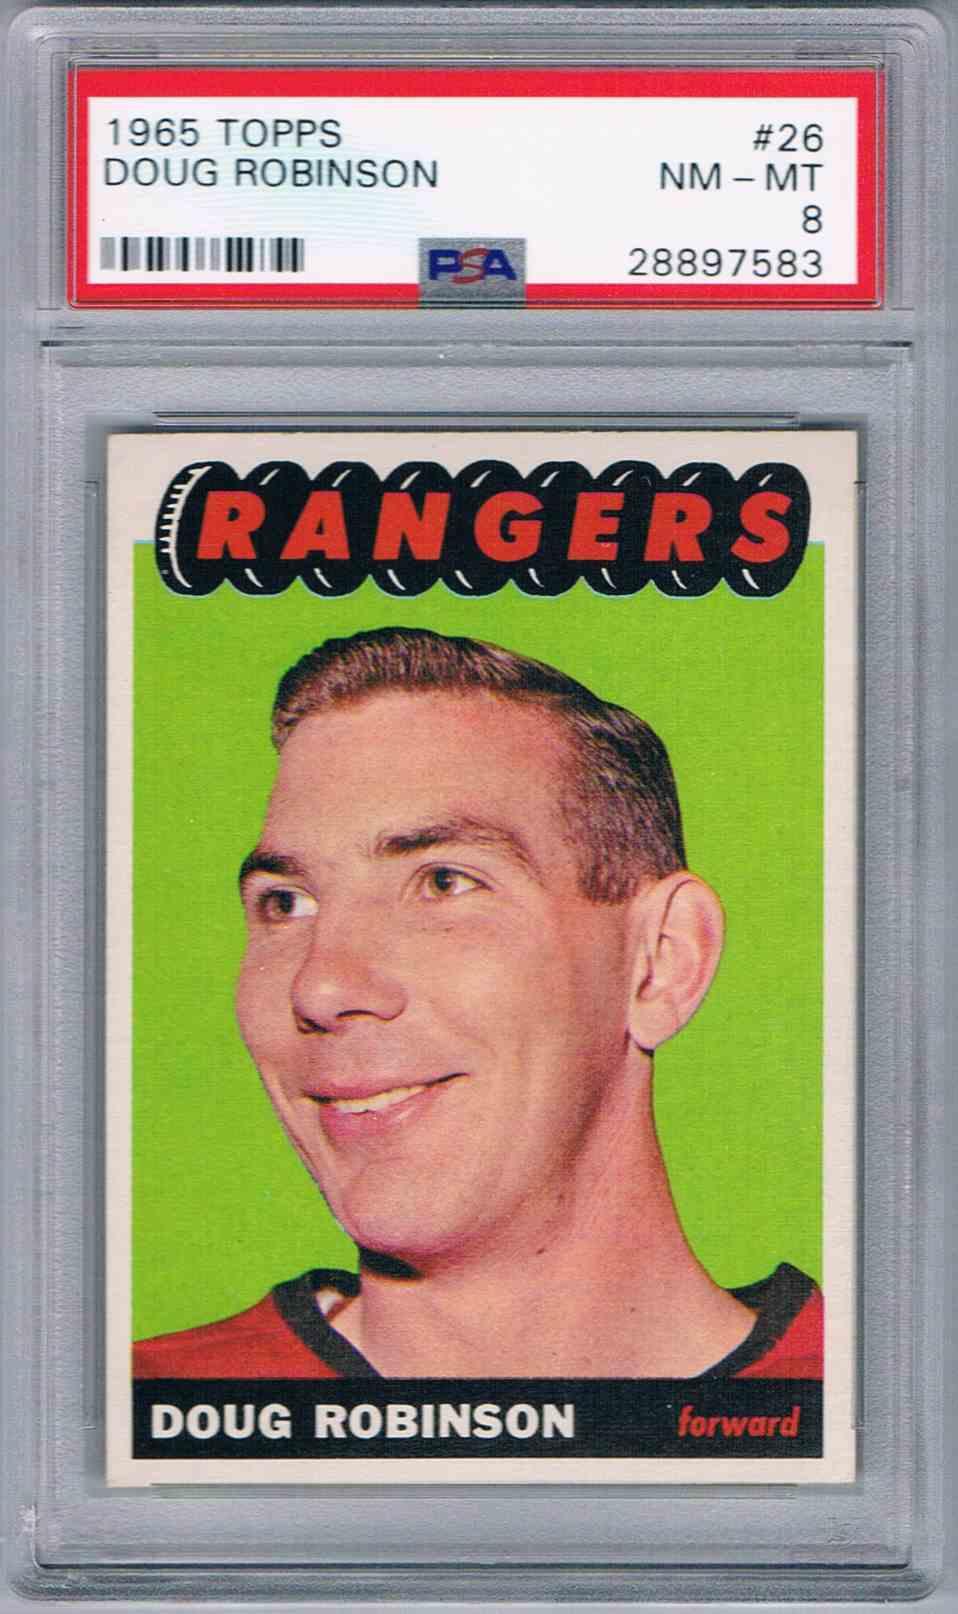 1965-66 Topps Doug Robinson #26 card front image